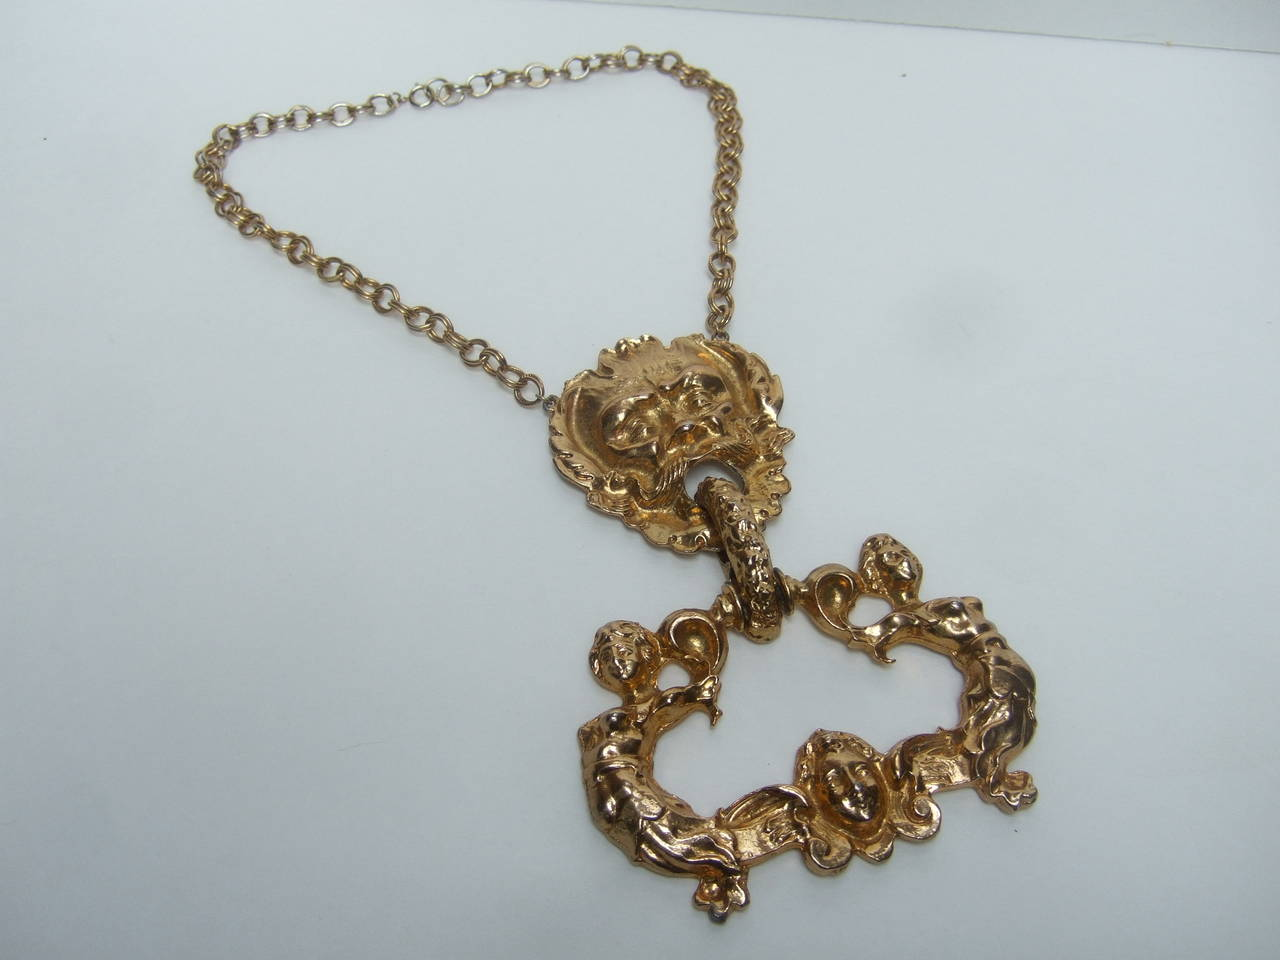 Massive Gilt Metal Figural Pendant Necklace c 1970 For Sale 5